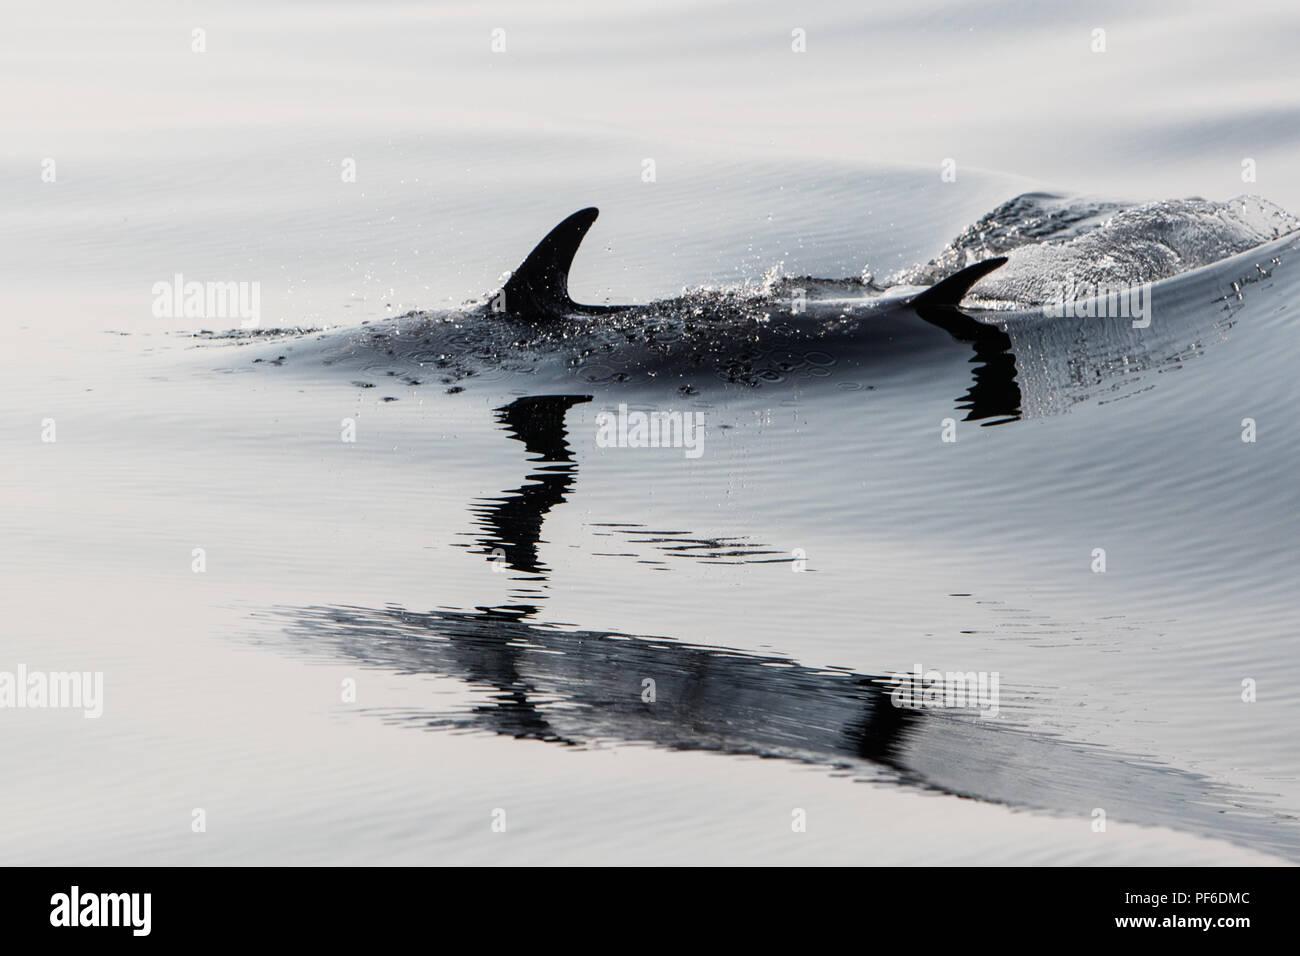 A quick and agile Short-Beaked Common dolphin, Delphinus delphis, swims in the north Atlantic Ocean off Cape Cod, Massachusetts. - Stock Image